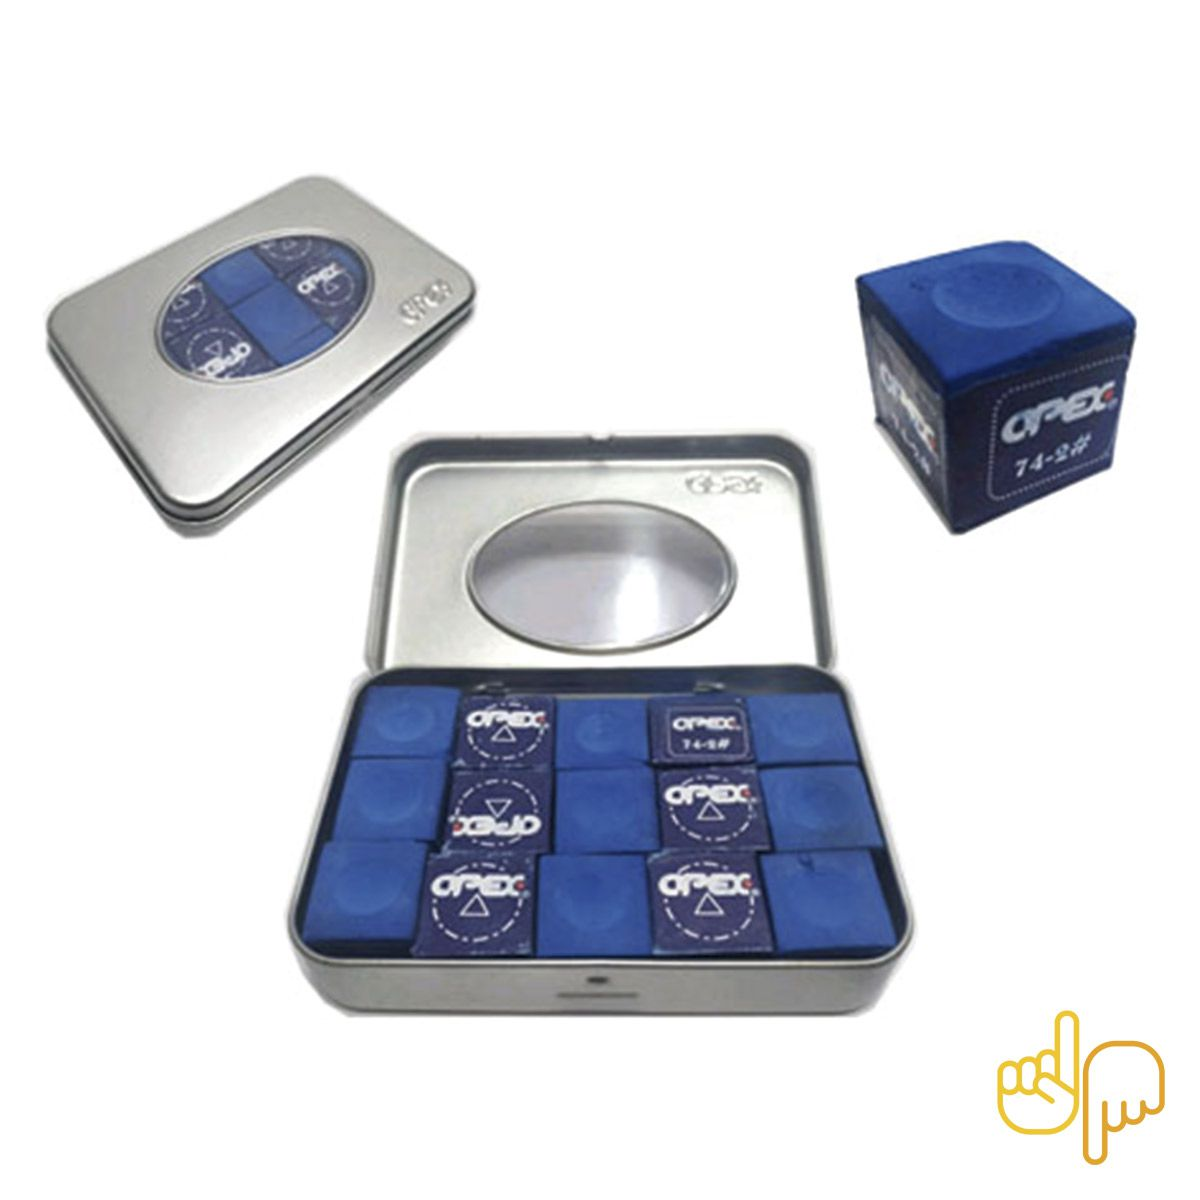 Giz Apex Profissional para Taco de Sinuca Bilhar Snooker Azul c/15 un